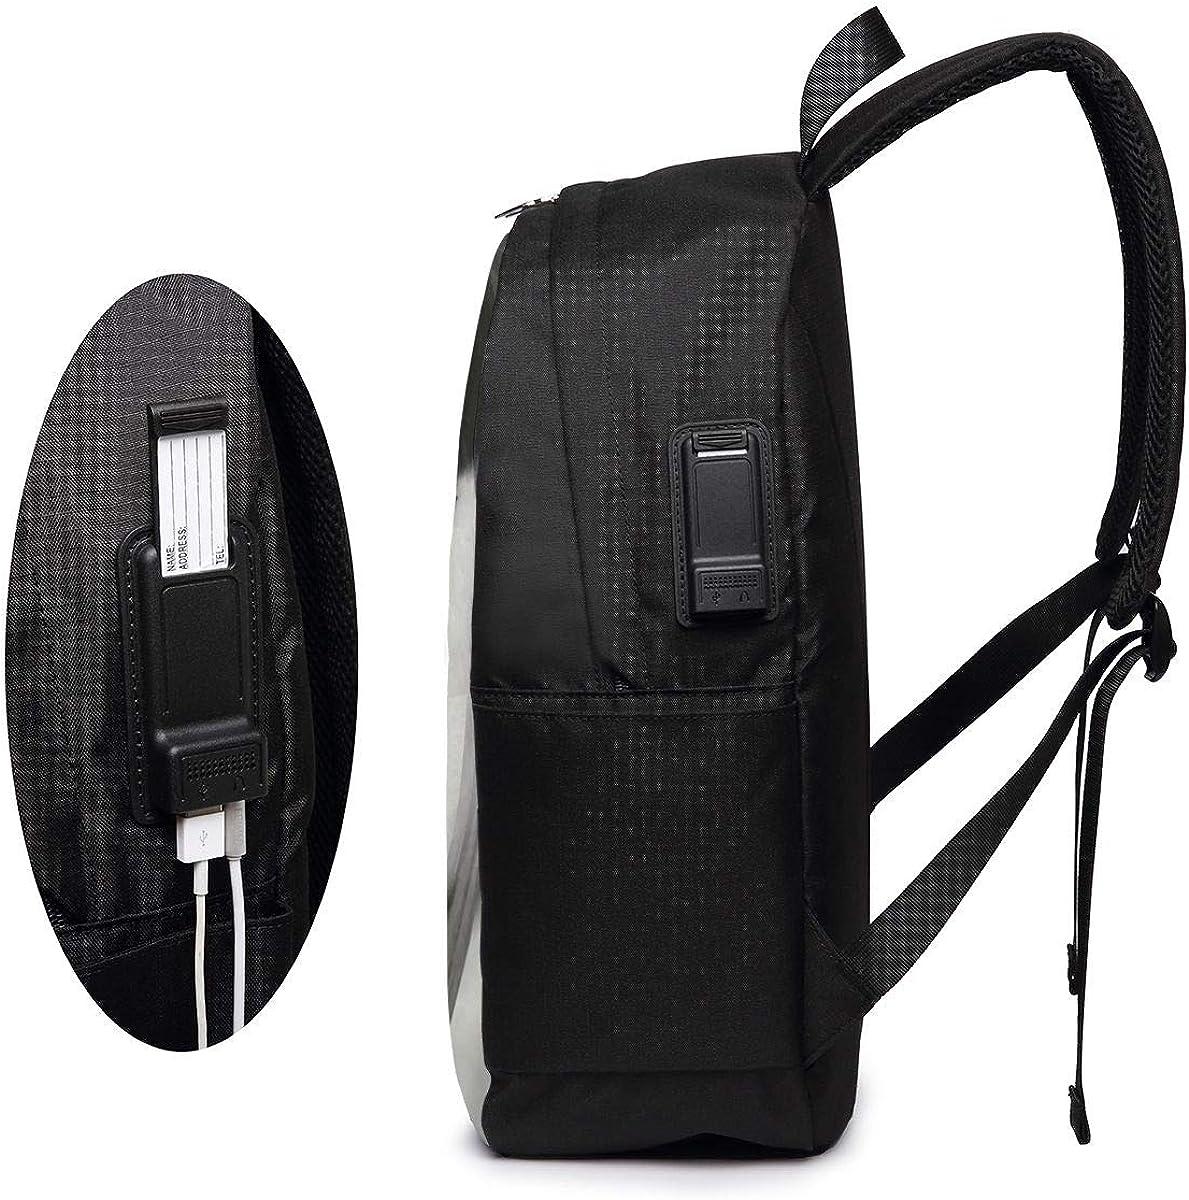 millenniumpaintingfl.com Carrying Cases Office & School Supplies ...